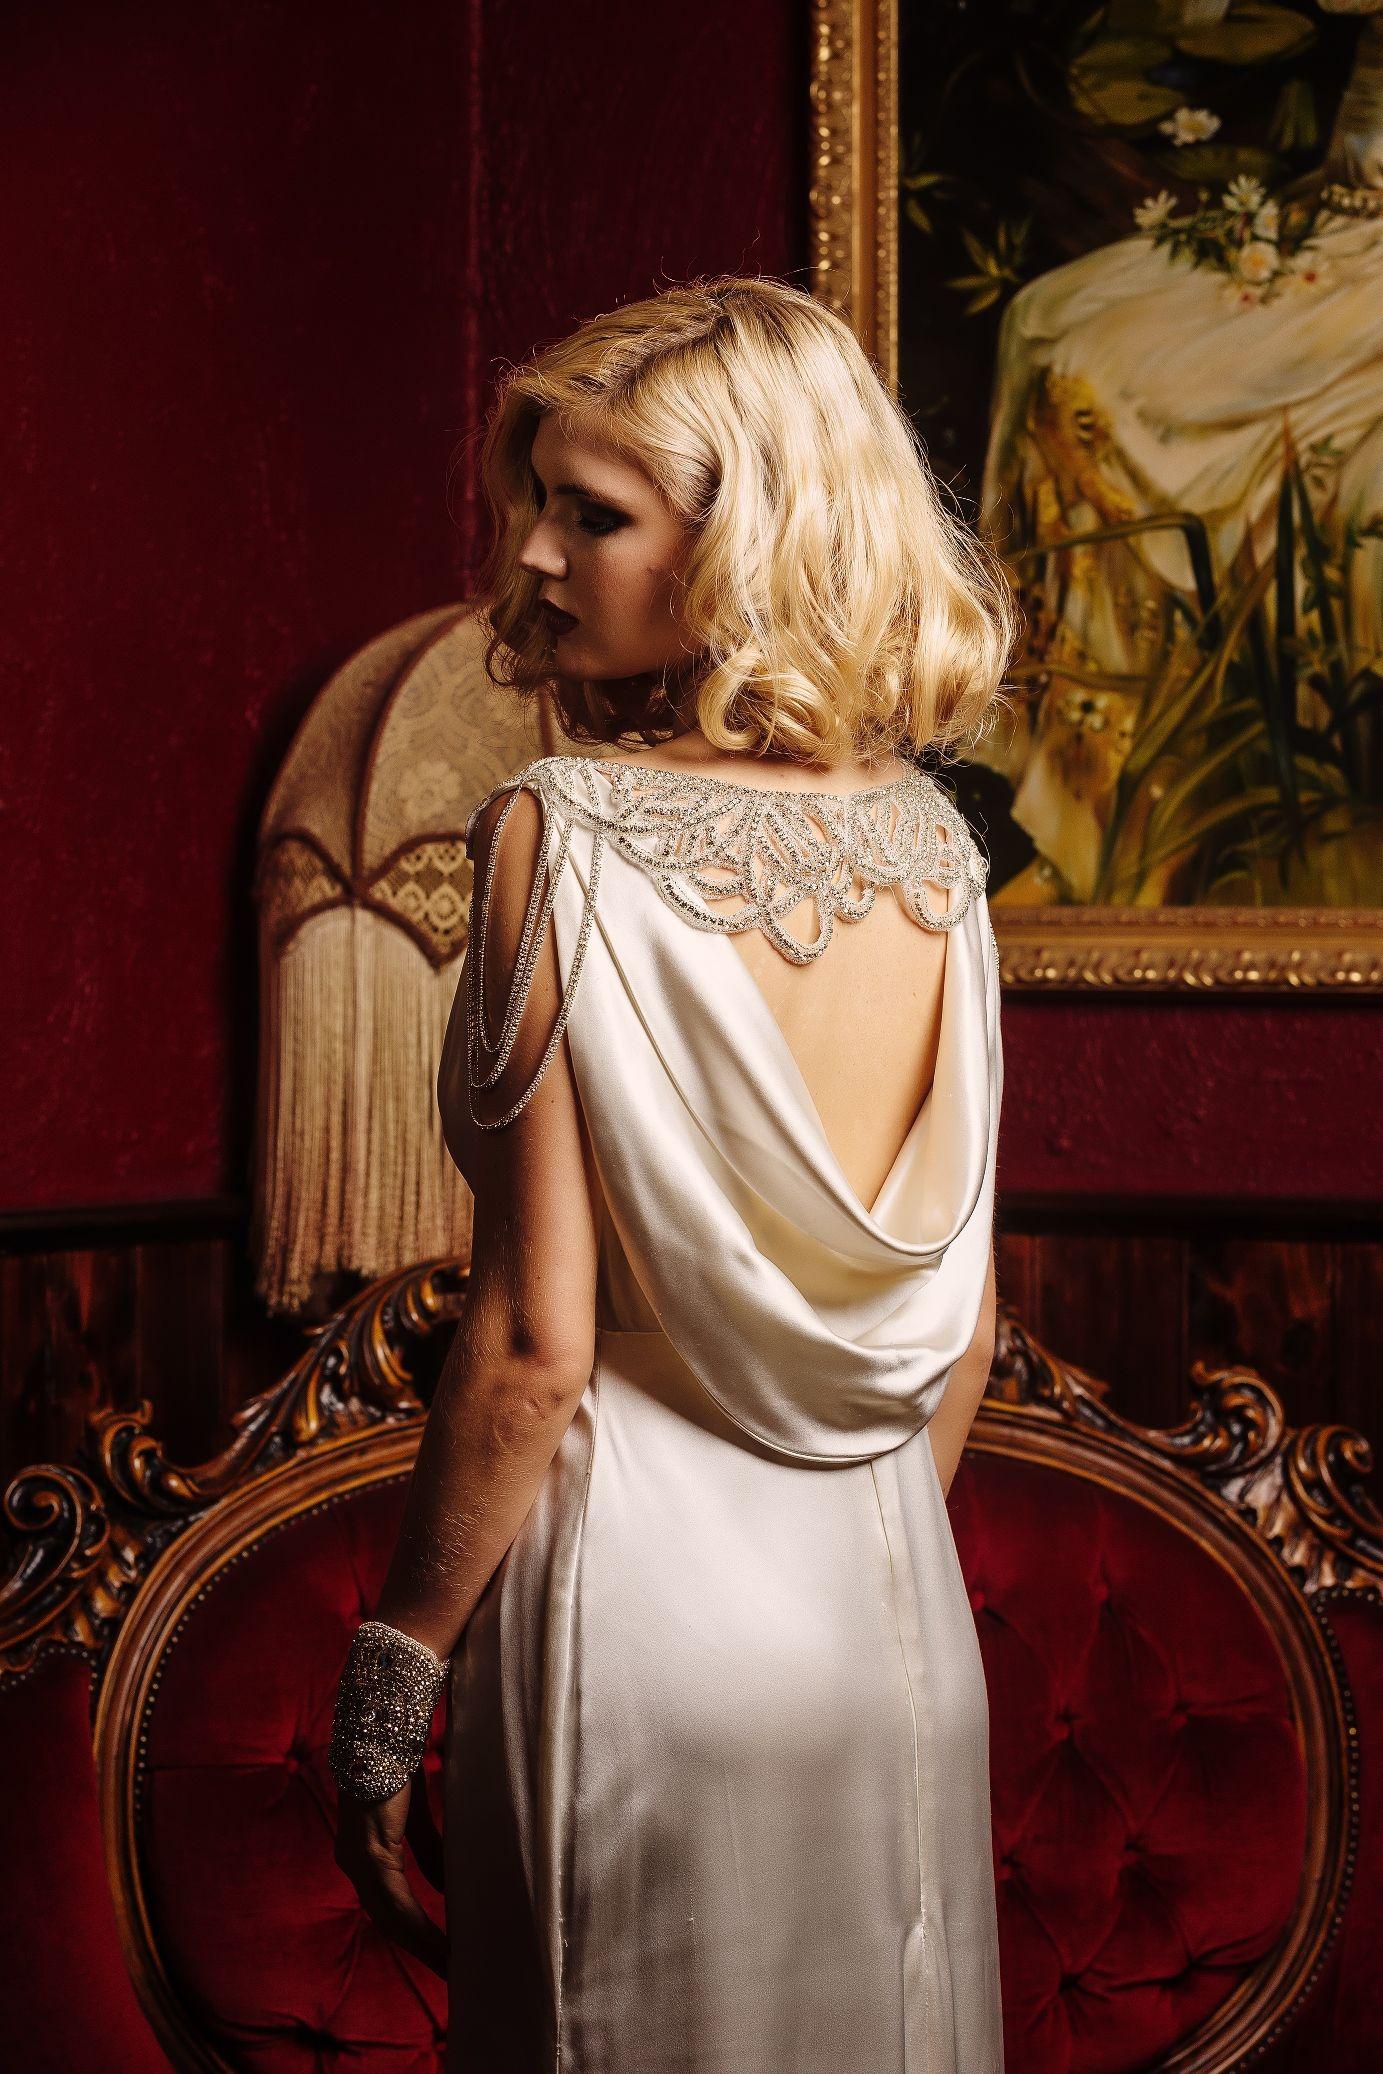 Hollywood Glamour Style Wedding Dresses : Glamorous old hollywood bridal shoot with cathleen jia wedding dresses